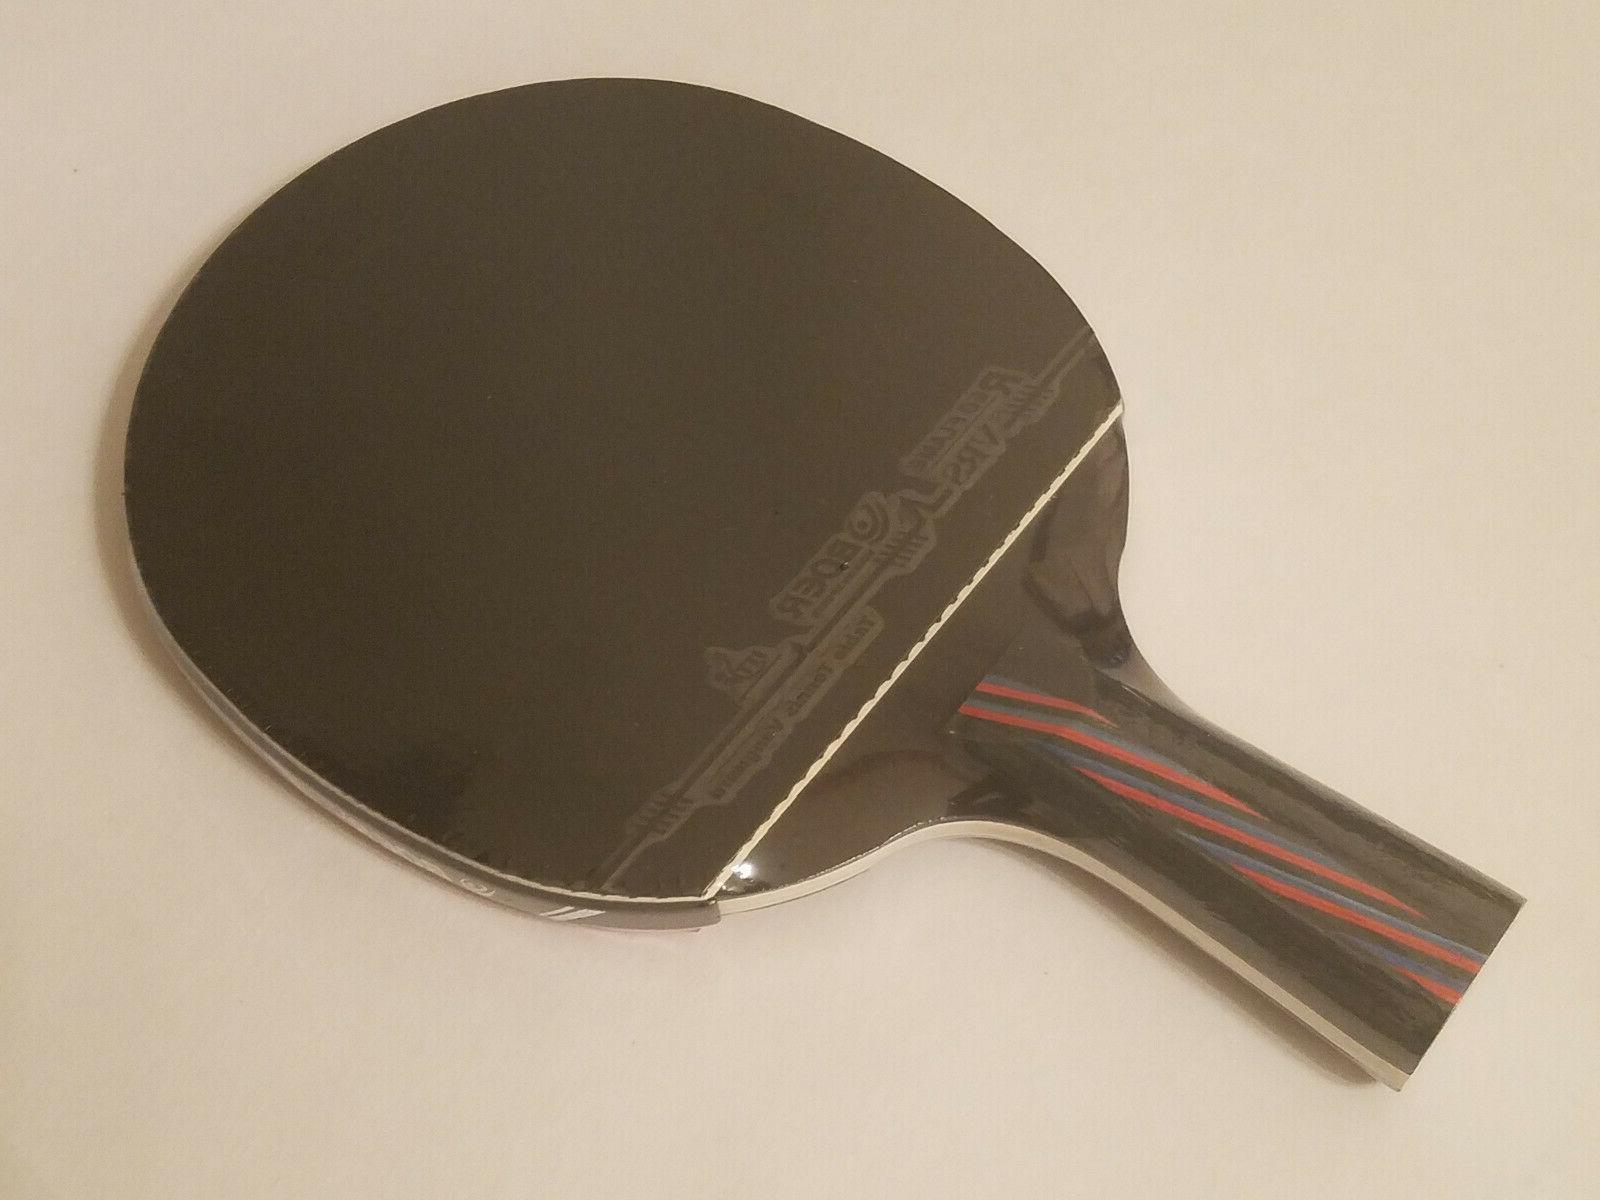 BOER Pong Table Tennis